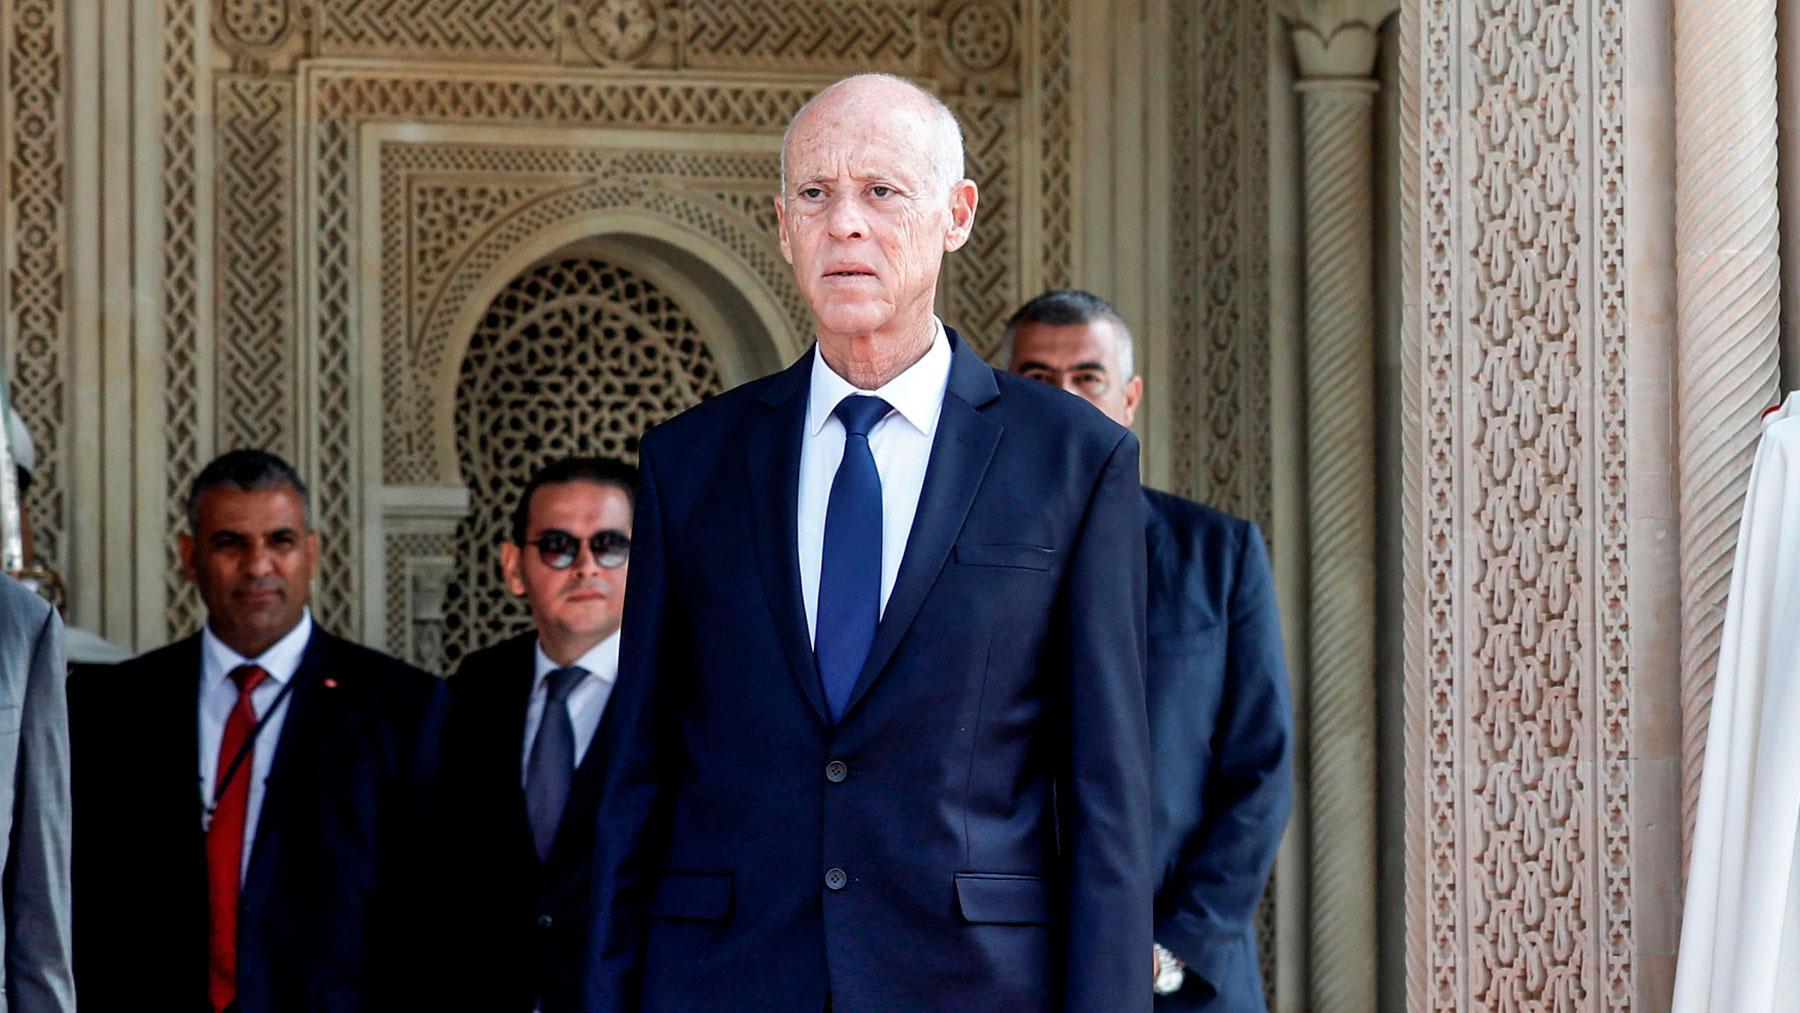 El presidente de Túnez. Kais Saied. Foto: EP